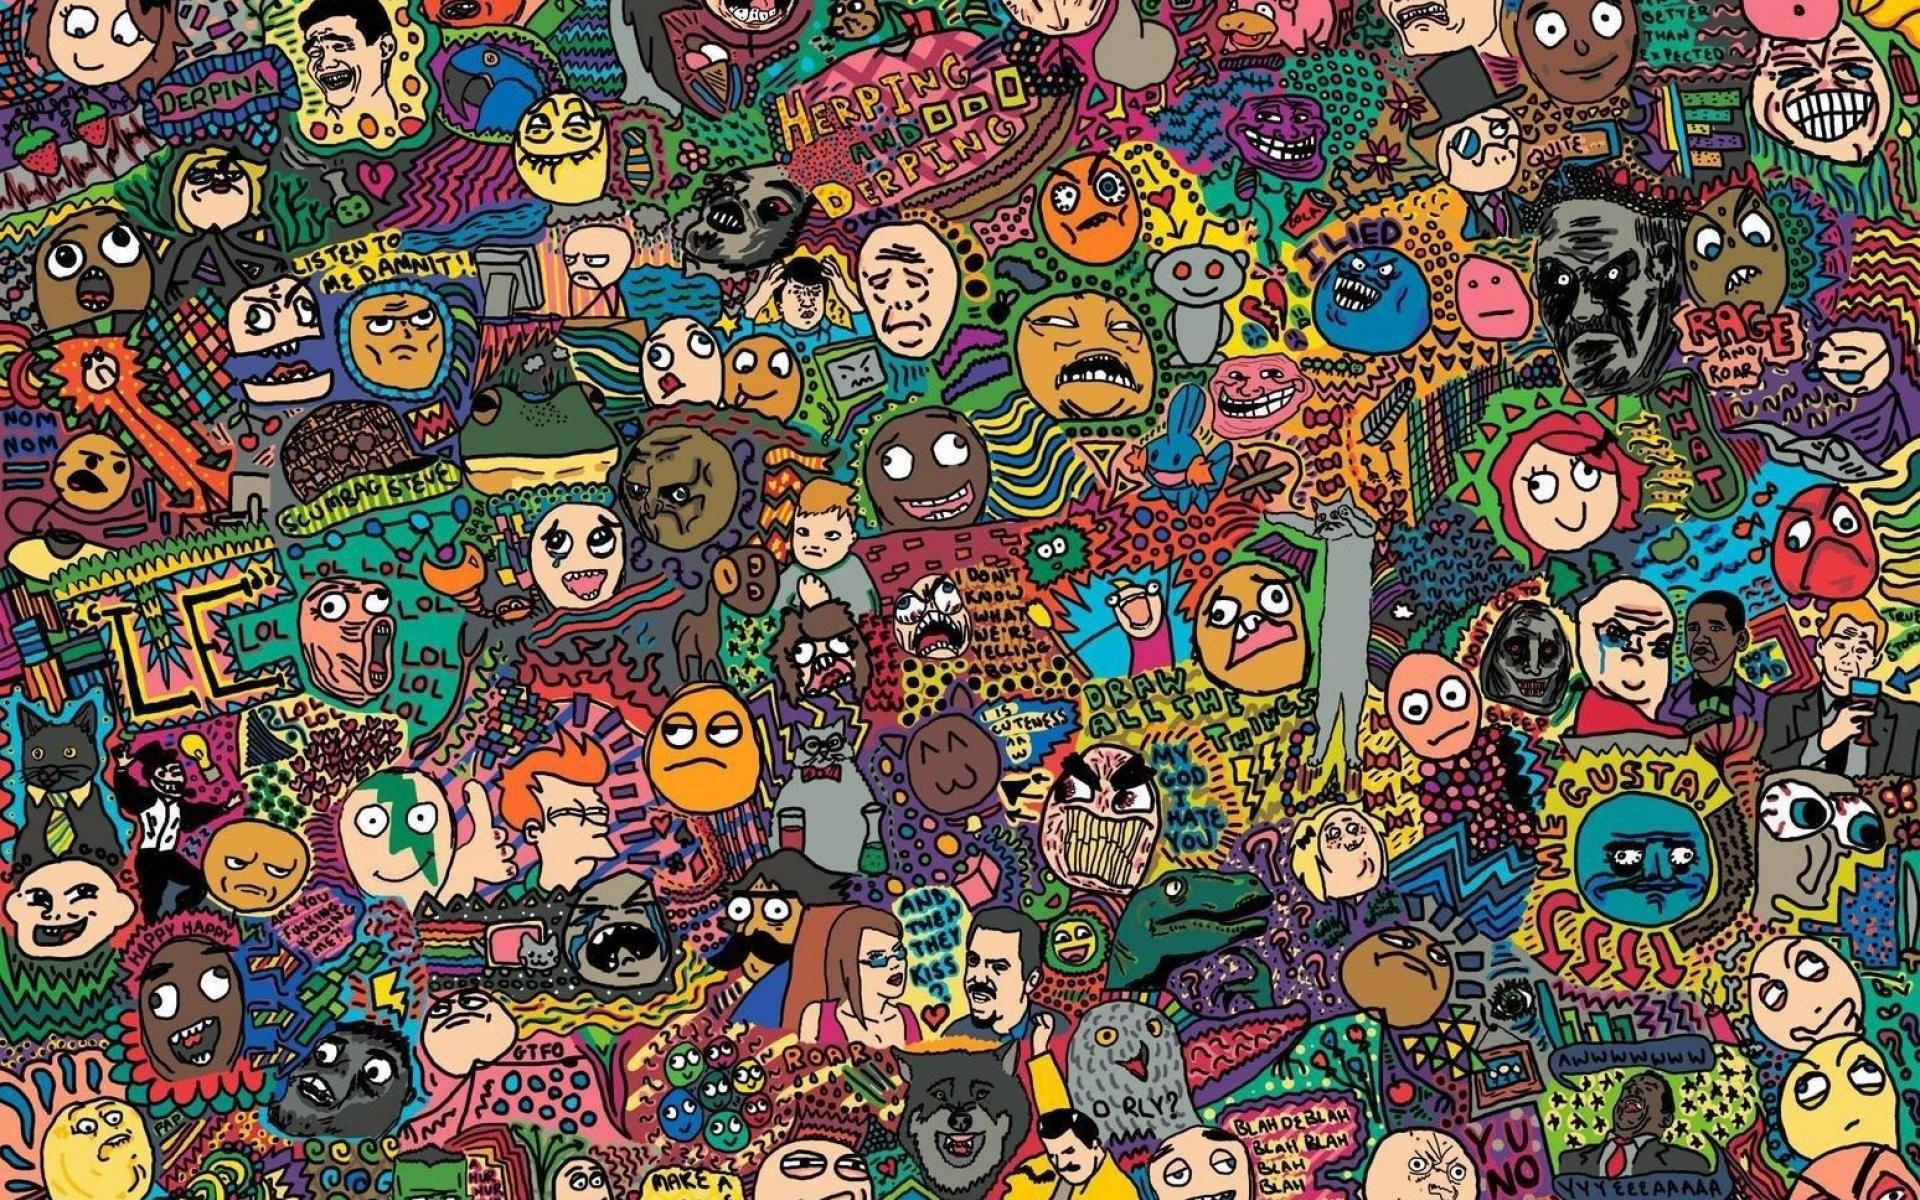 25 Best Memes About Pepe Wallpaper | Pepe Wallpaper Memes